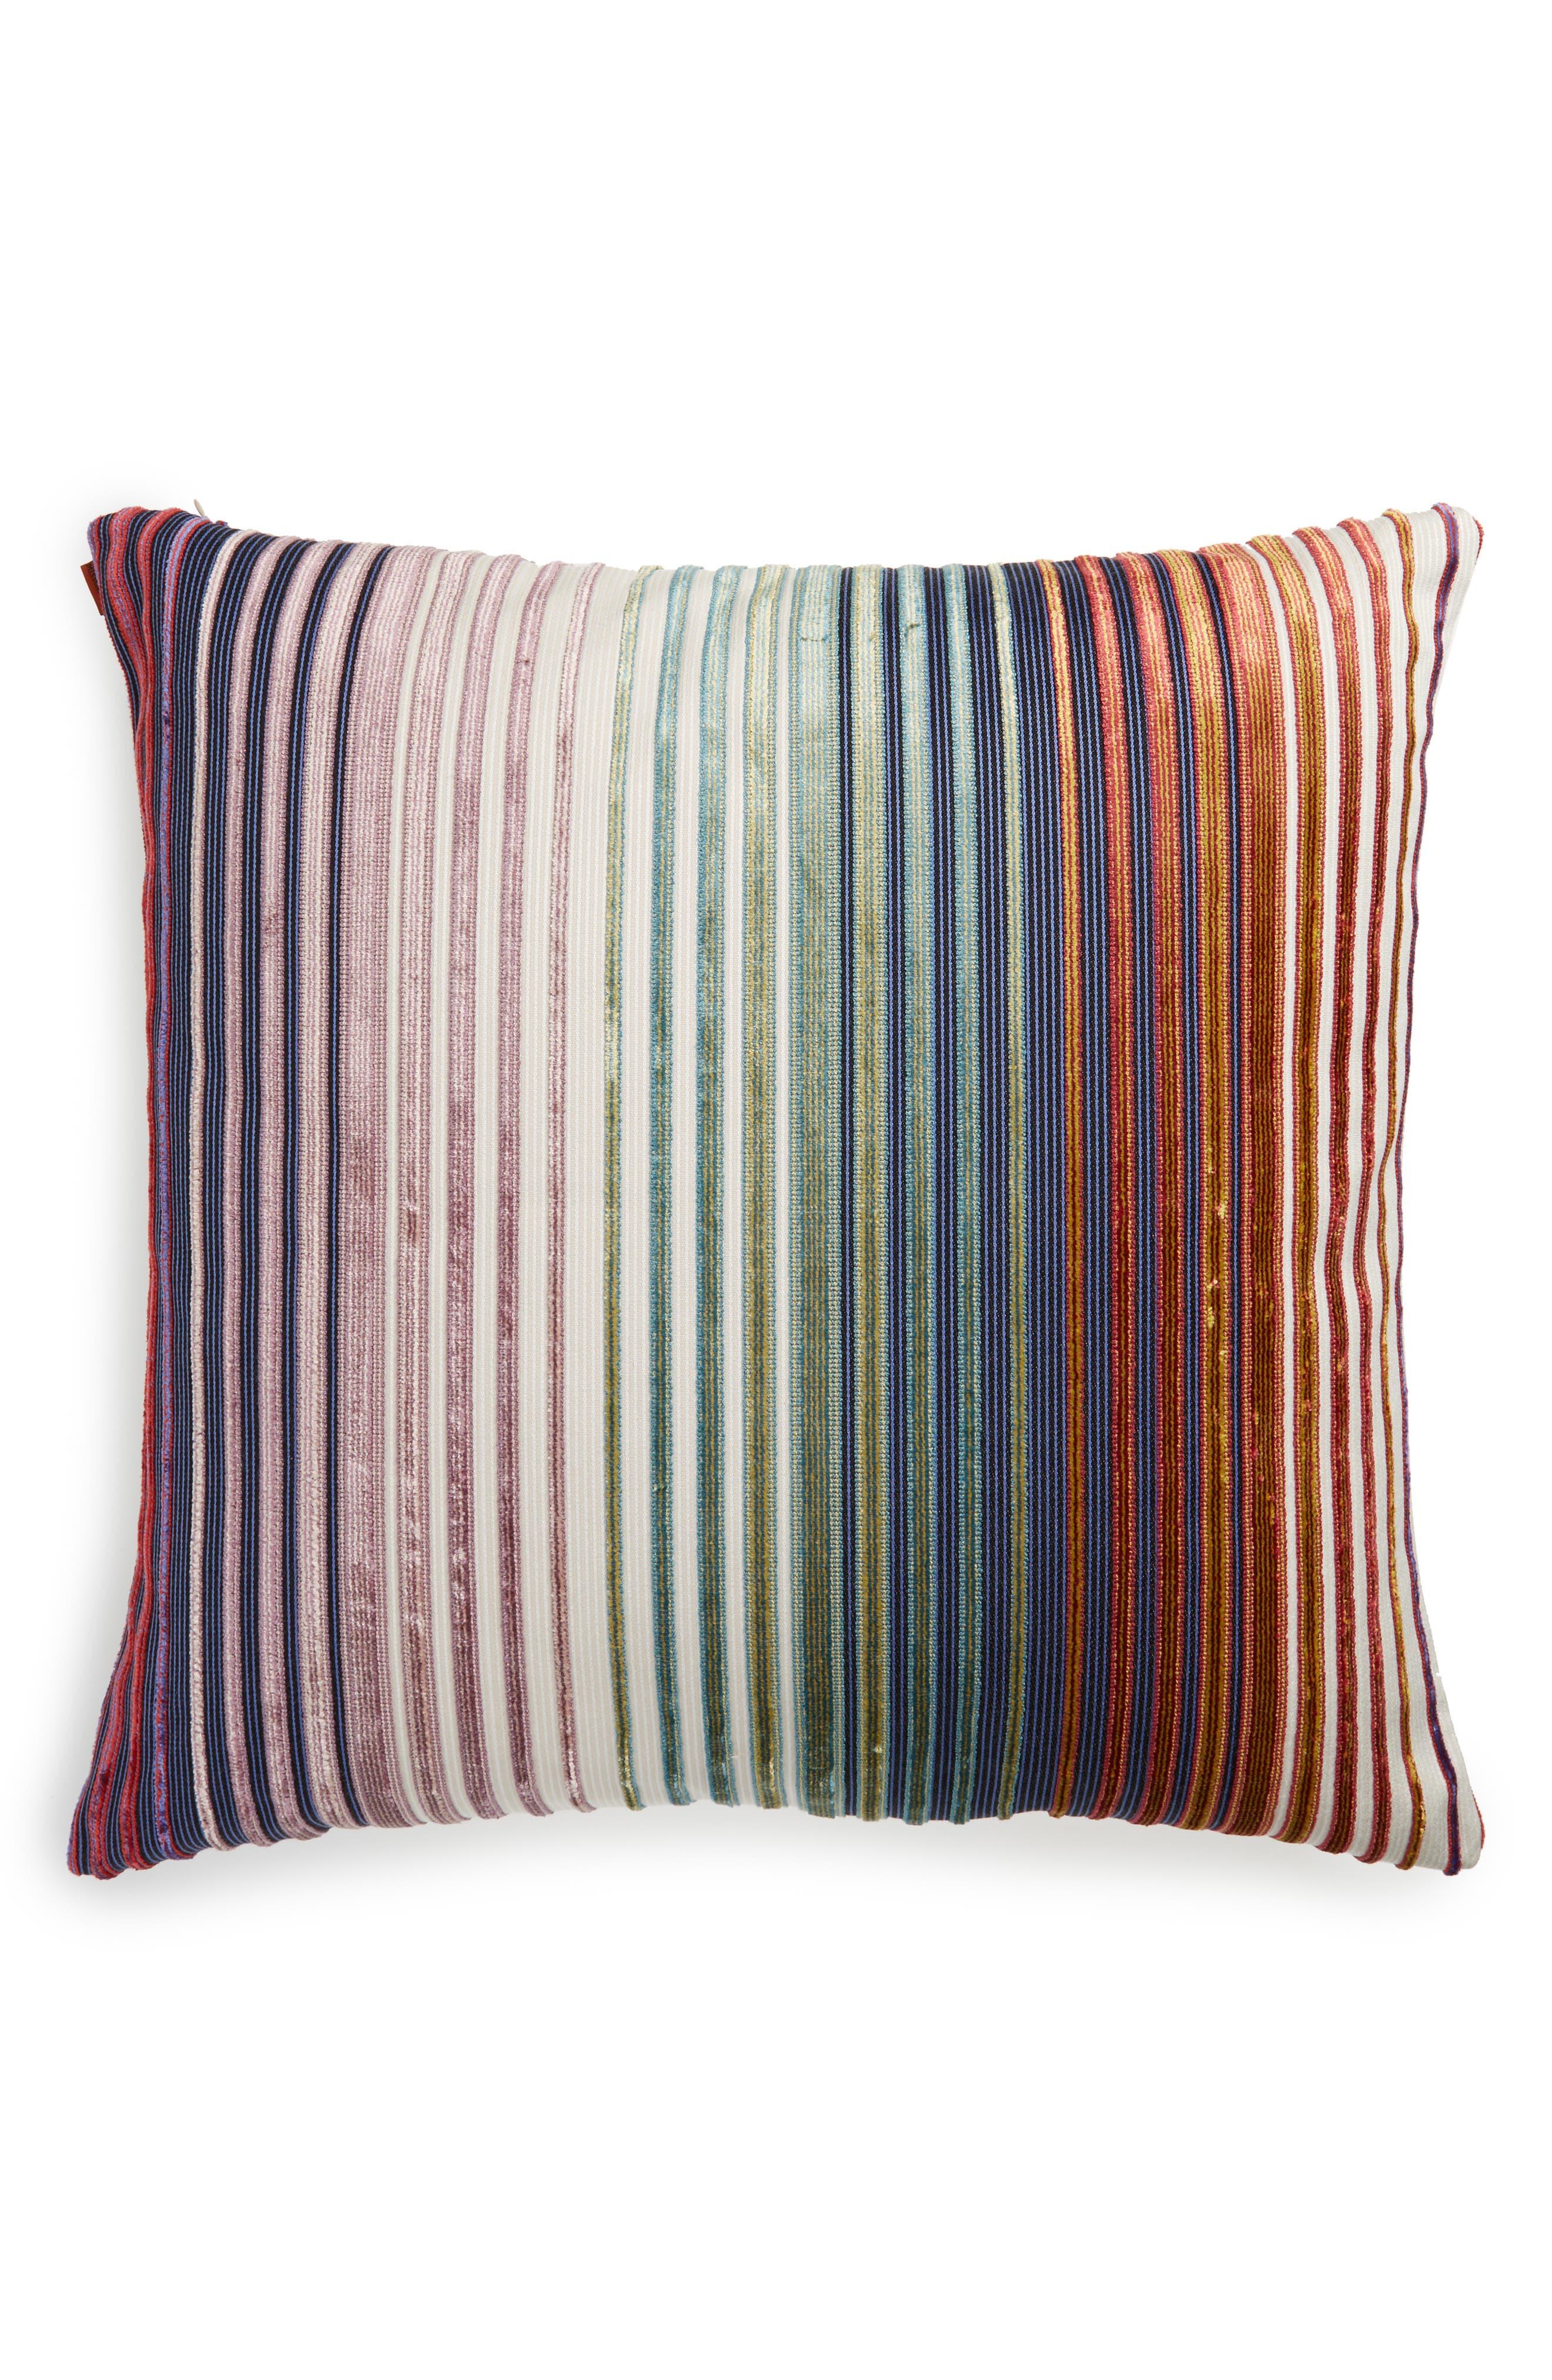 Tunisi Accent Pillow,                         Main,                         color, Multi Color